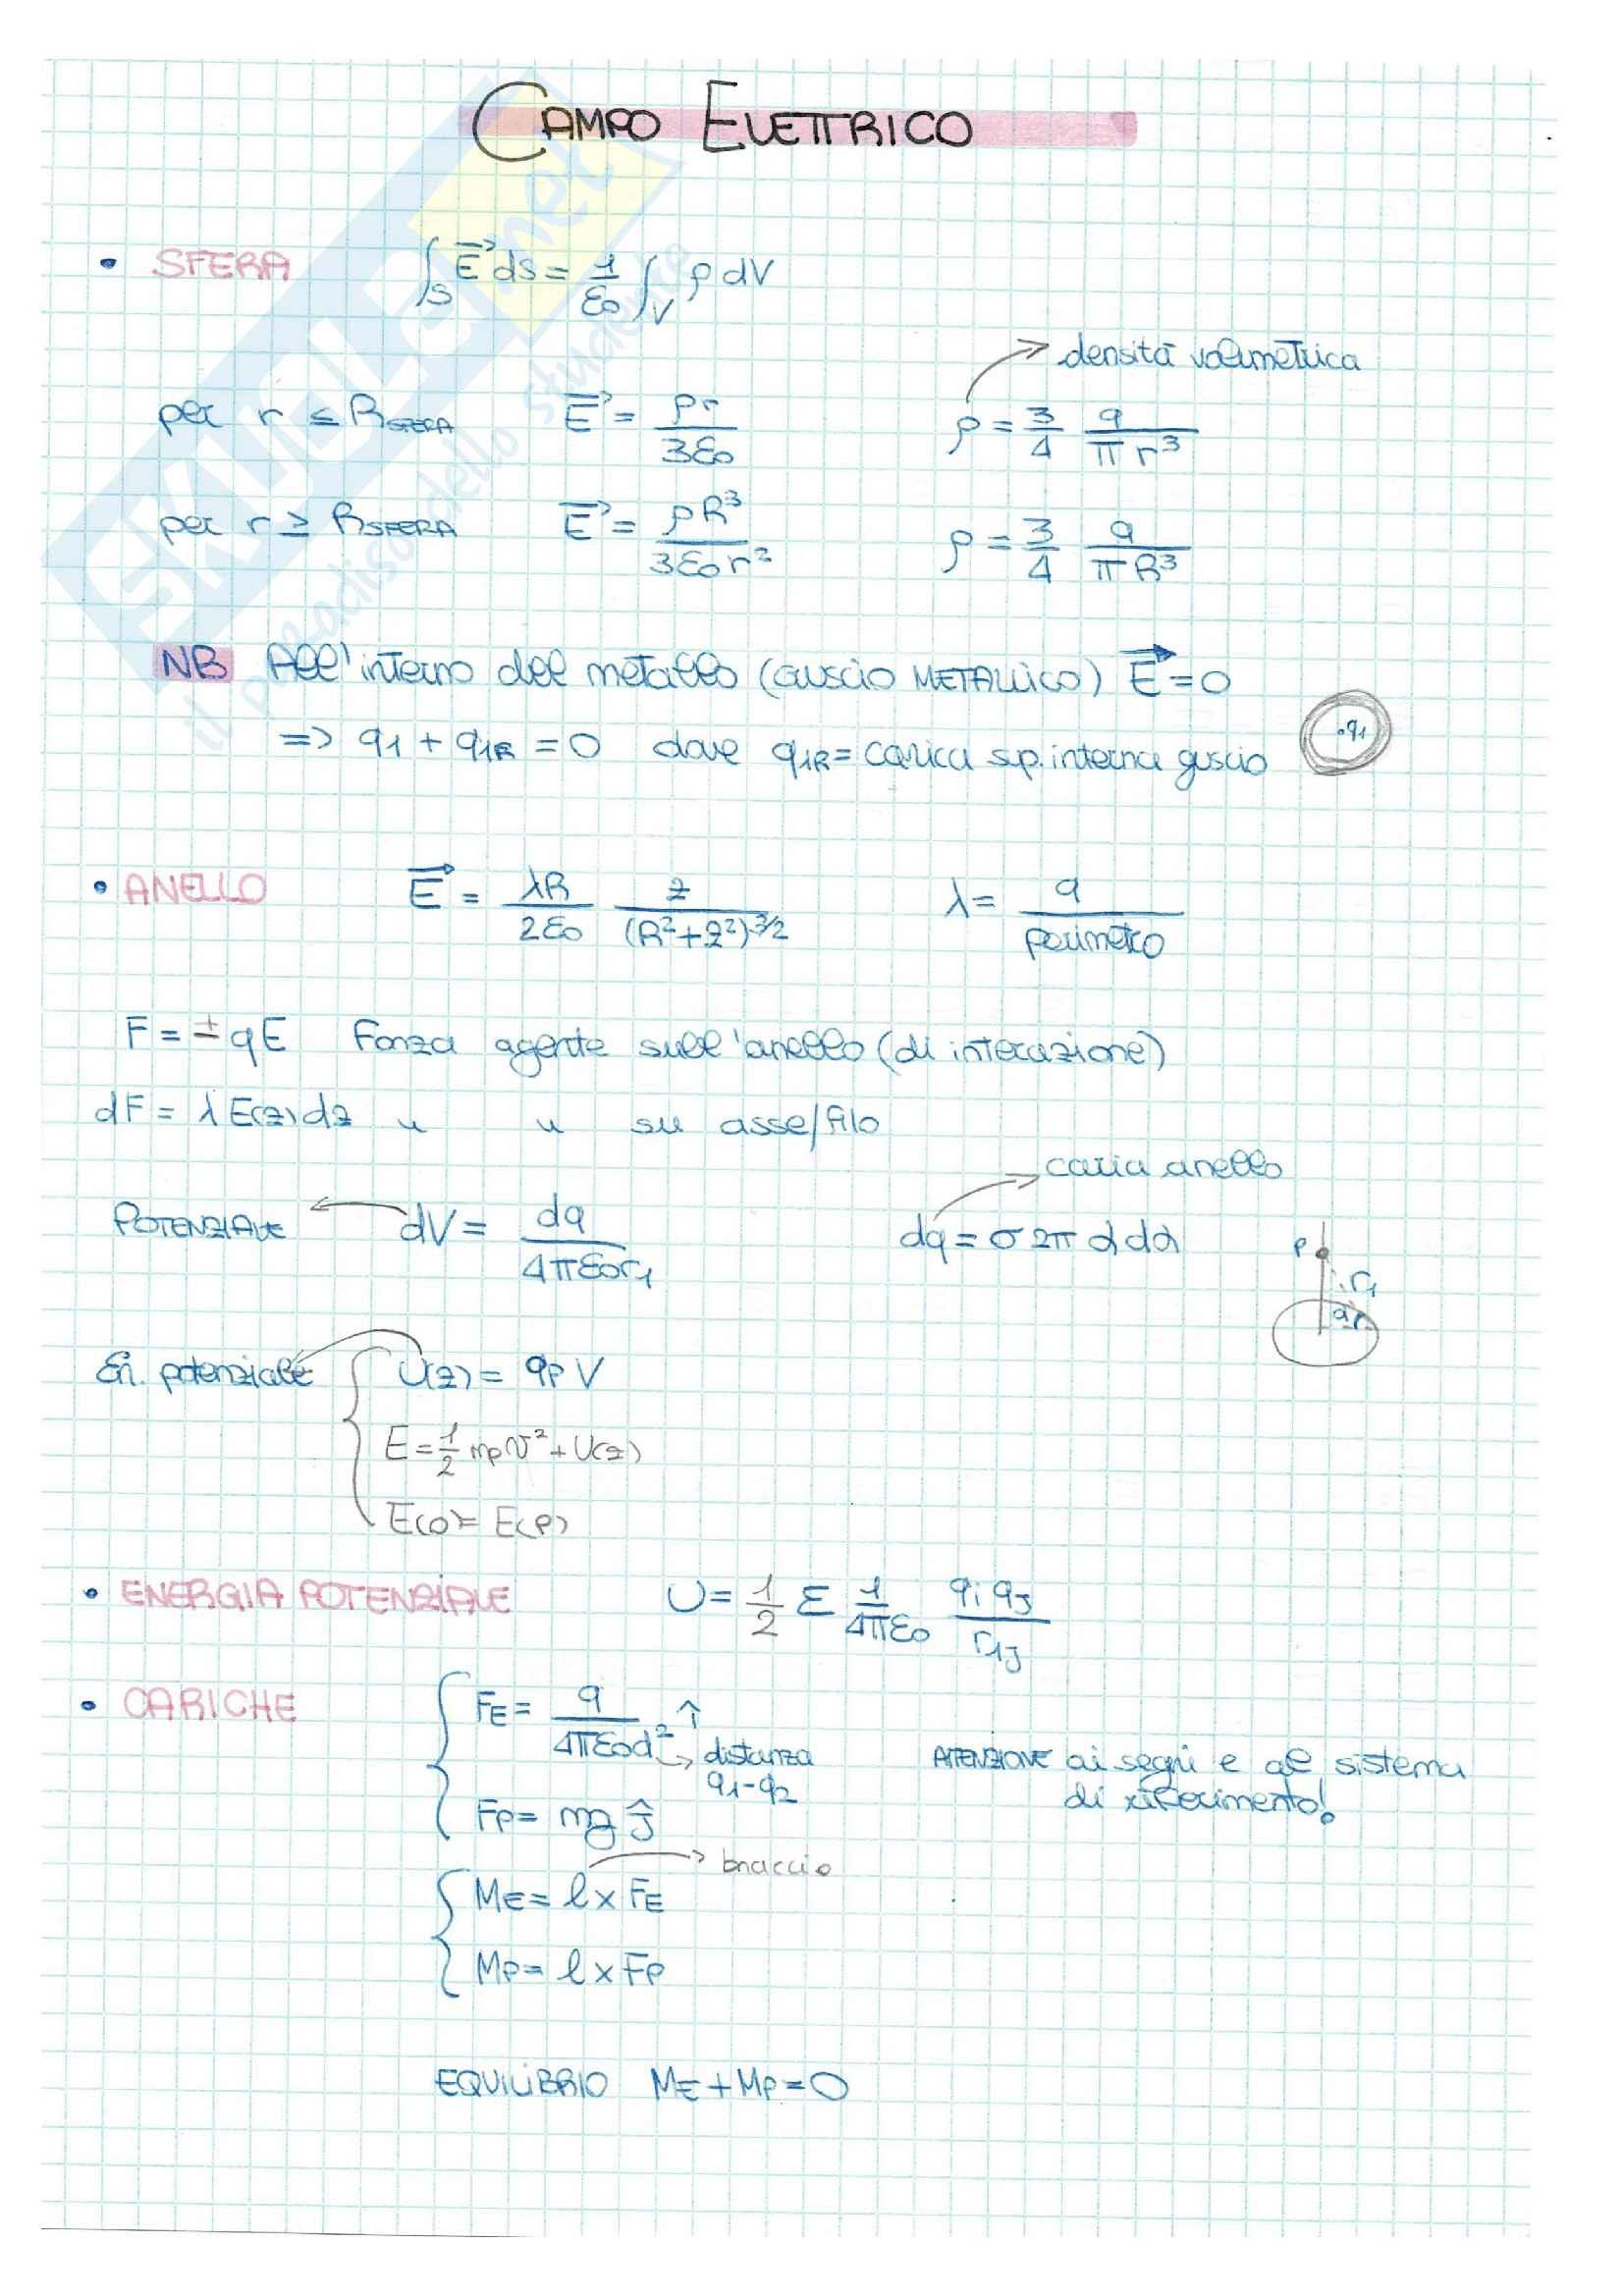 Schemi riassuntivi per risolvere esercizi di Fisica 2